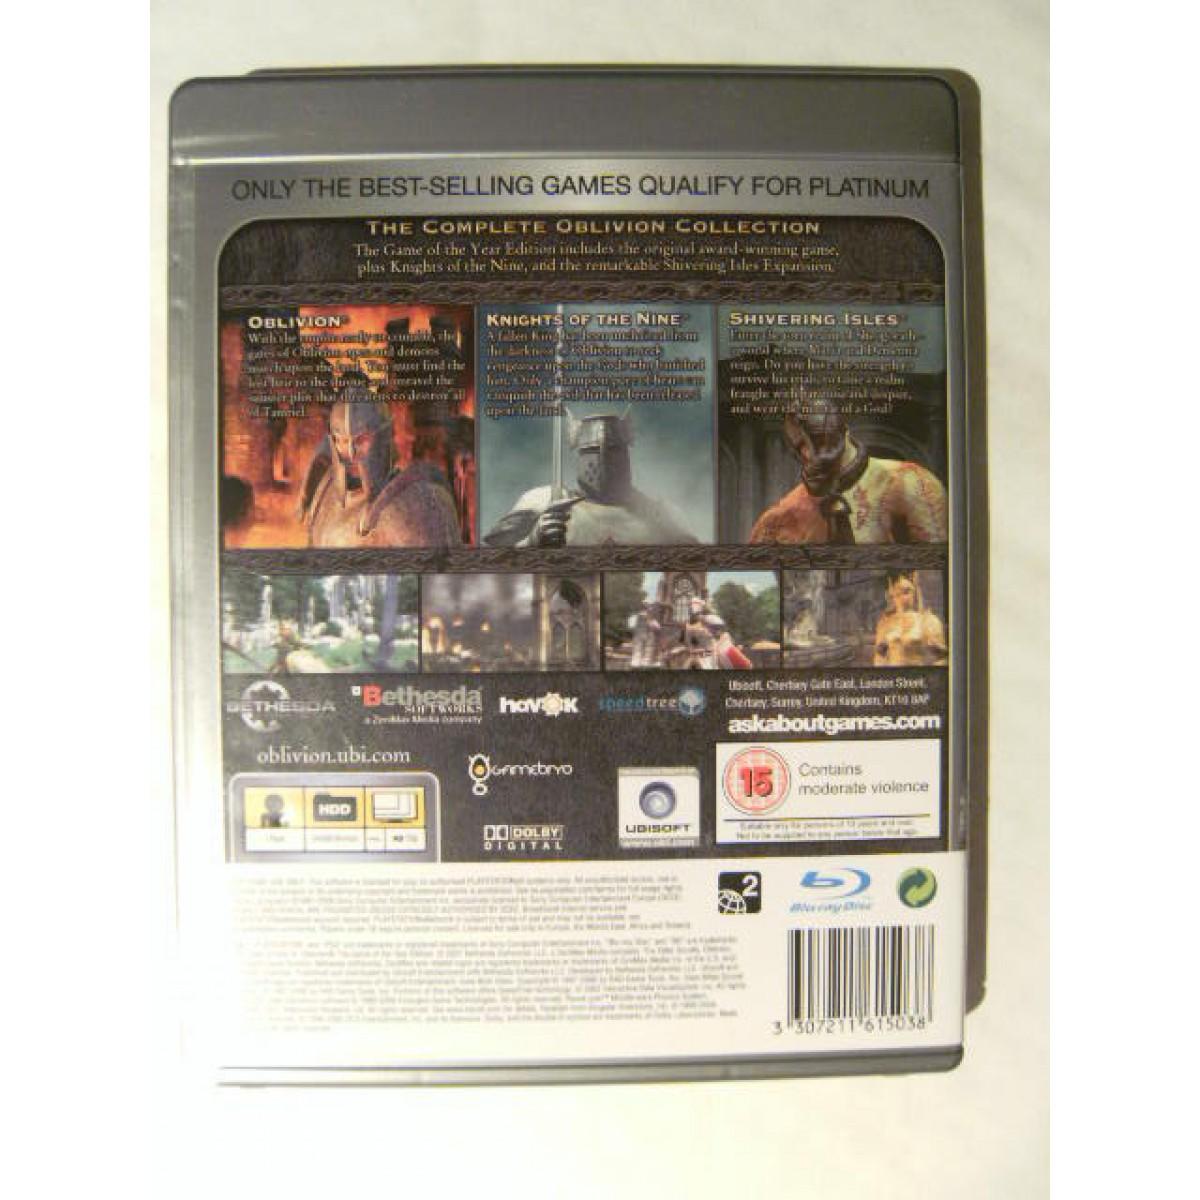 Elder Scrolls IV: Oblivion GOTY for Playstation 3